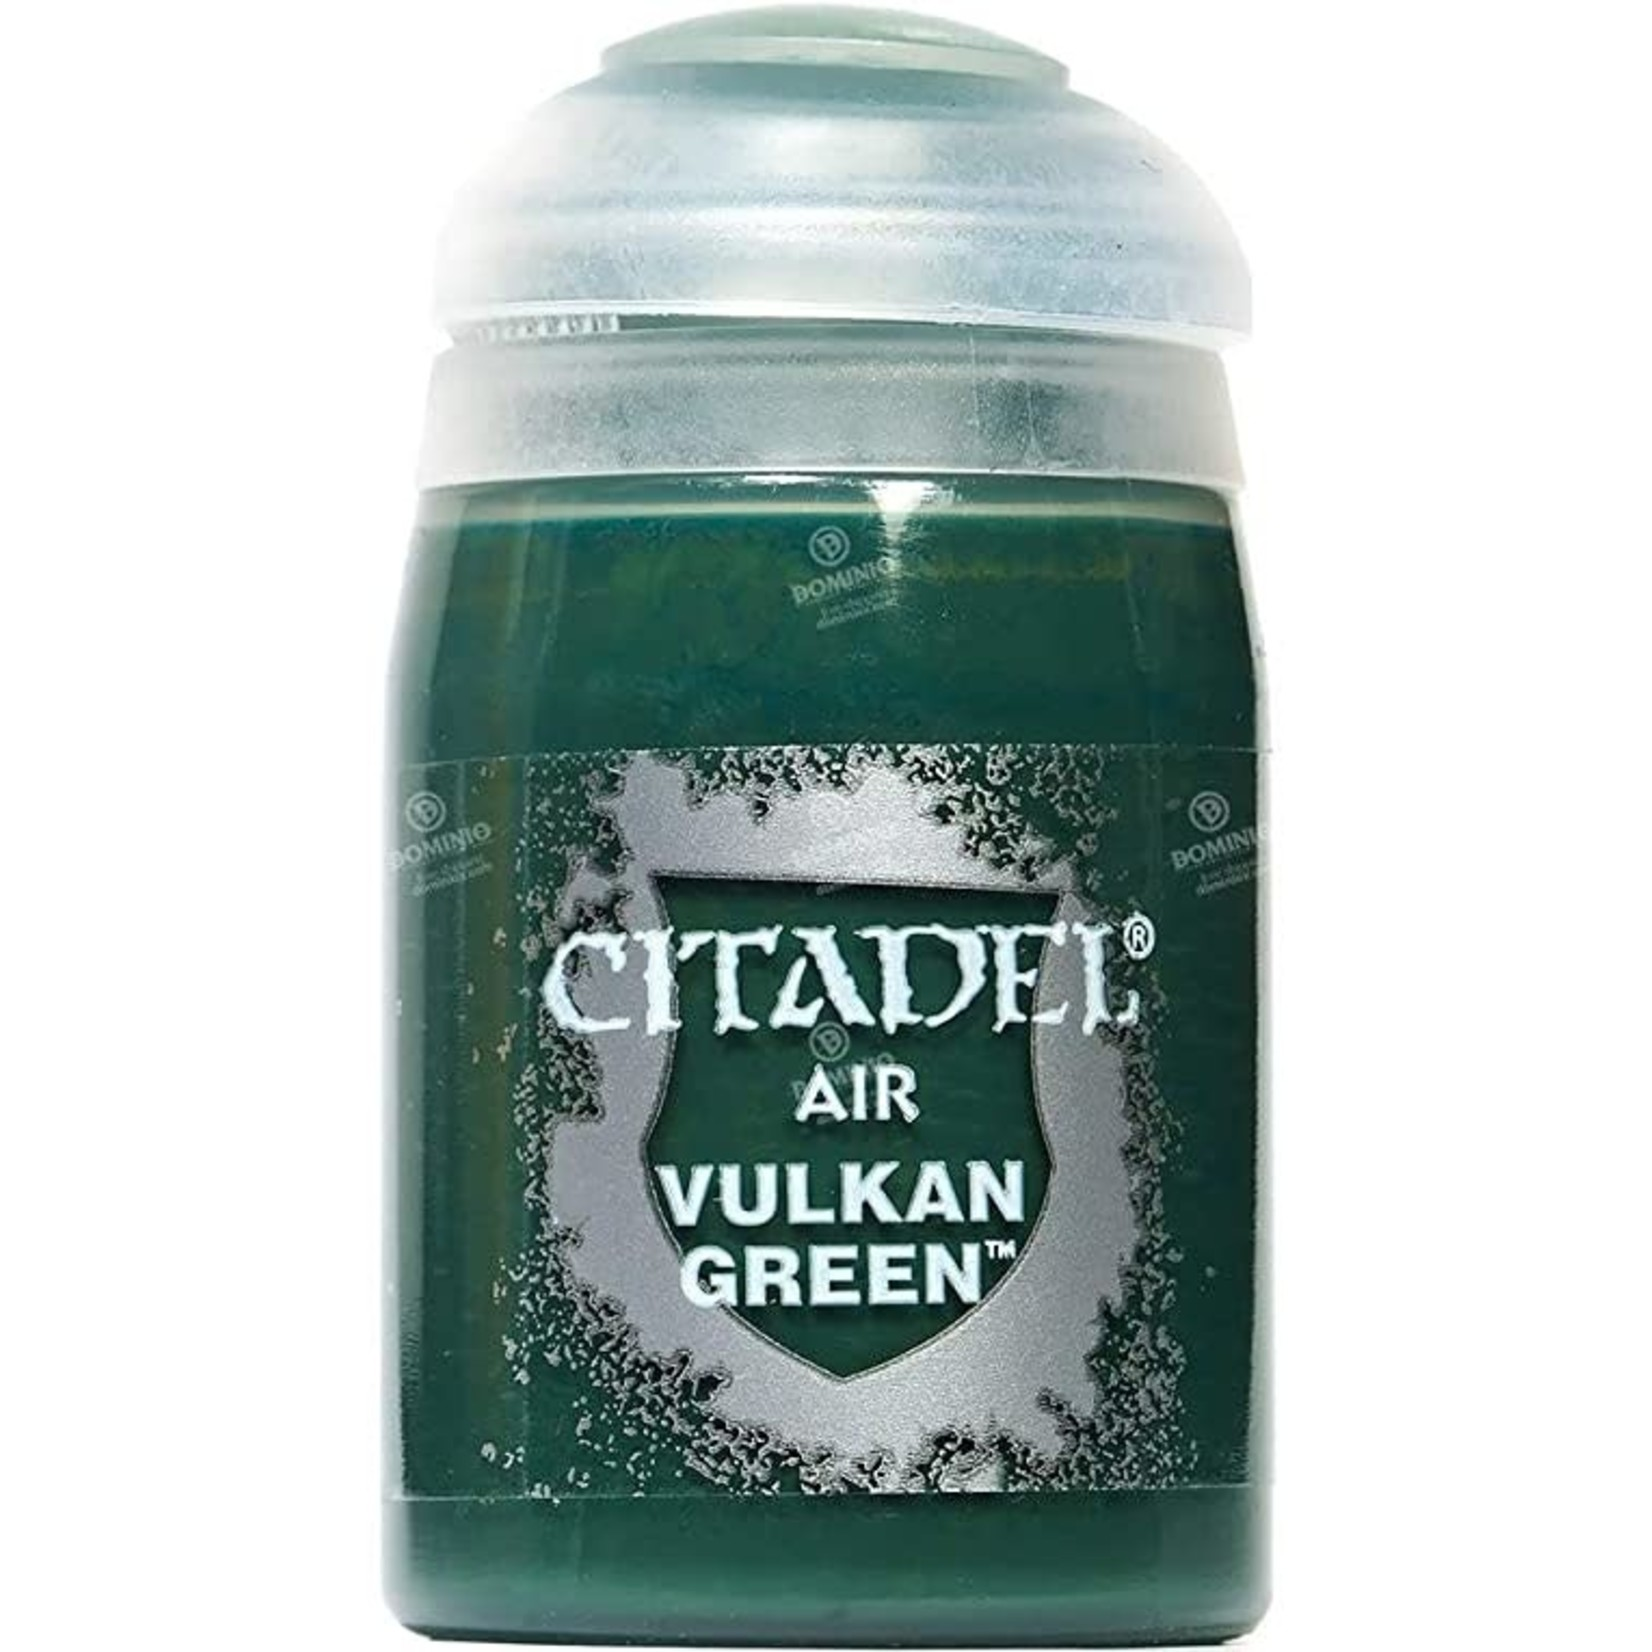 Games Workshop Citadel Paint: Vulkan Green Air (24 ml)